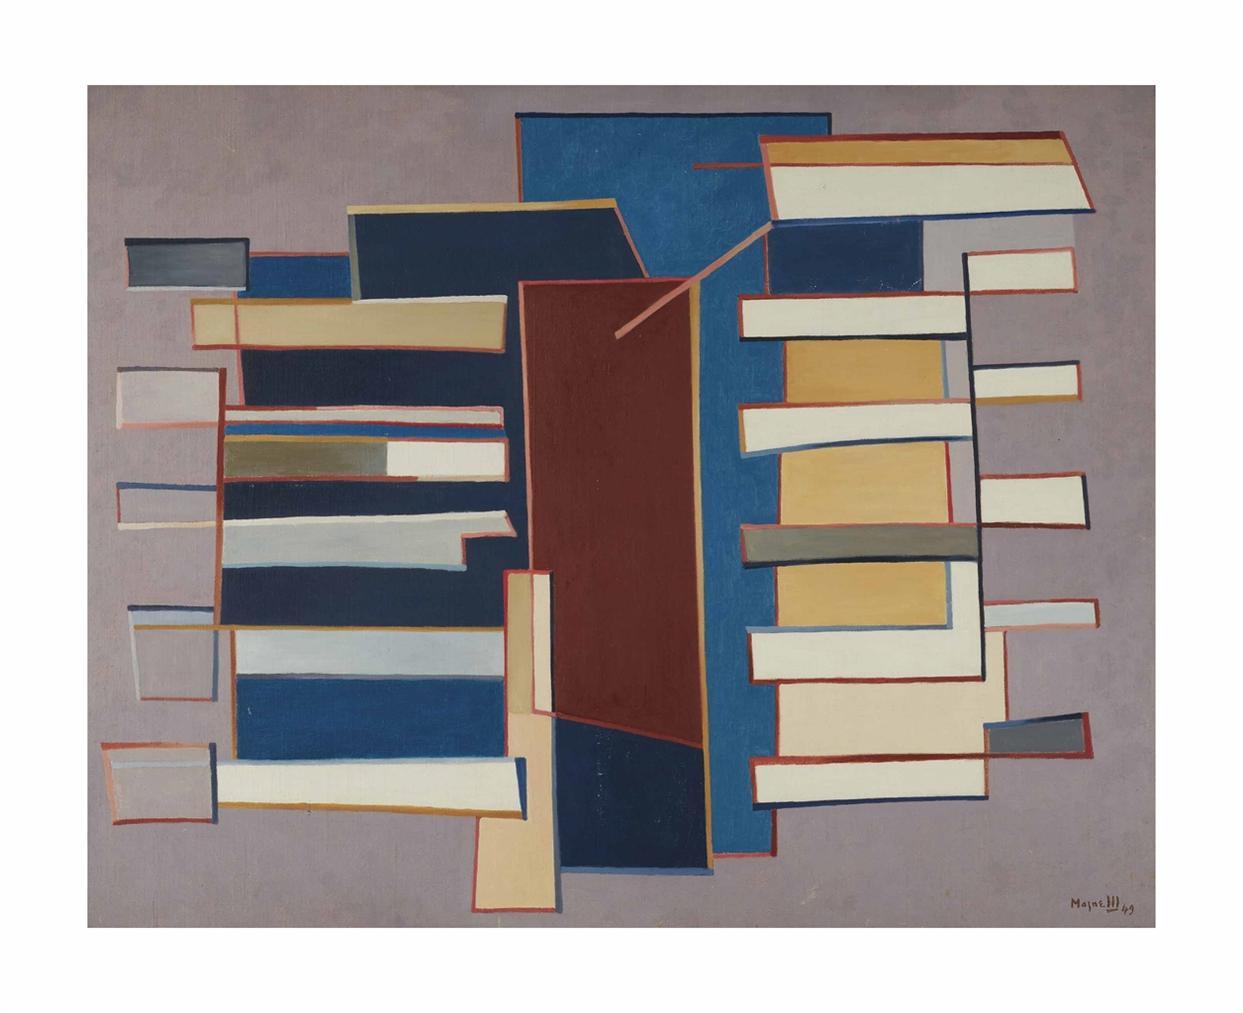 Alberto Magnelli-Direction Entouree-1949